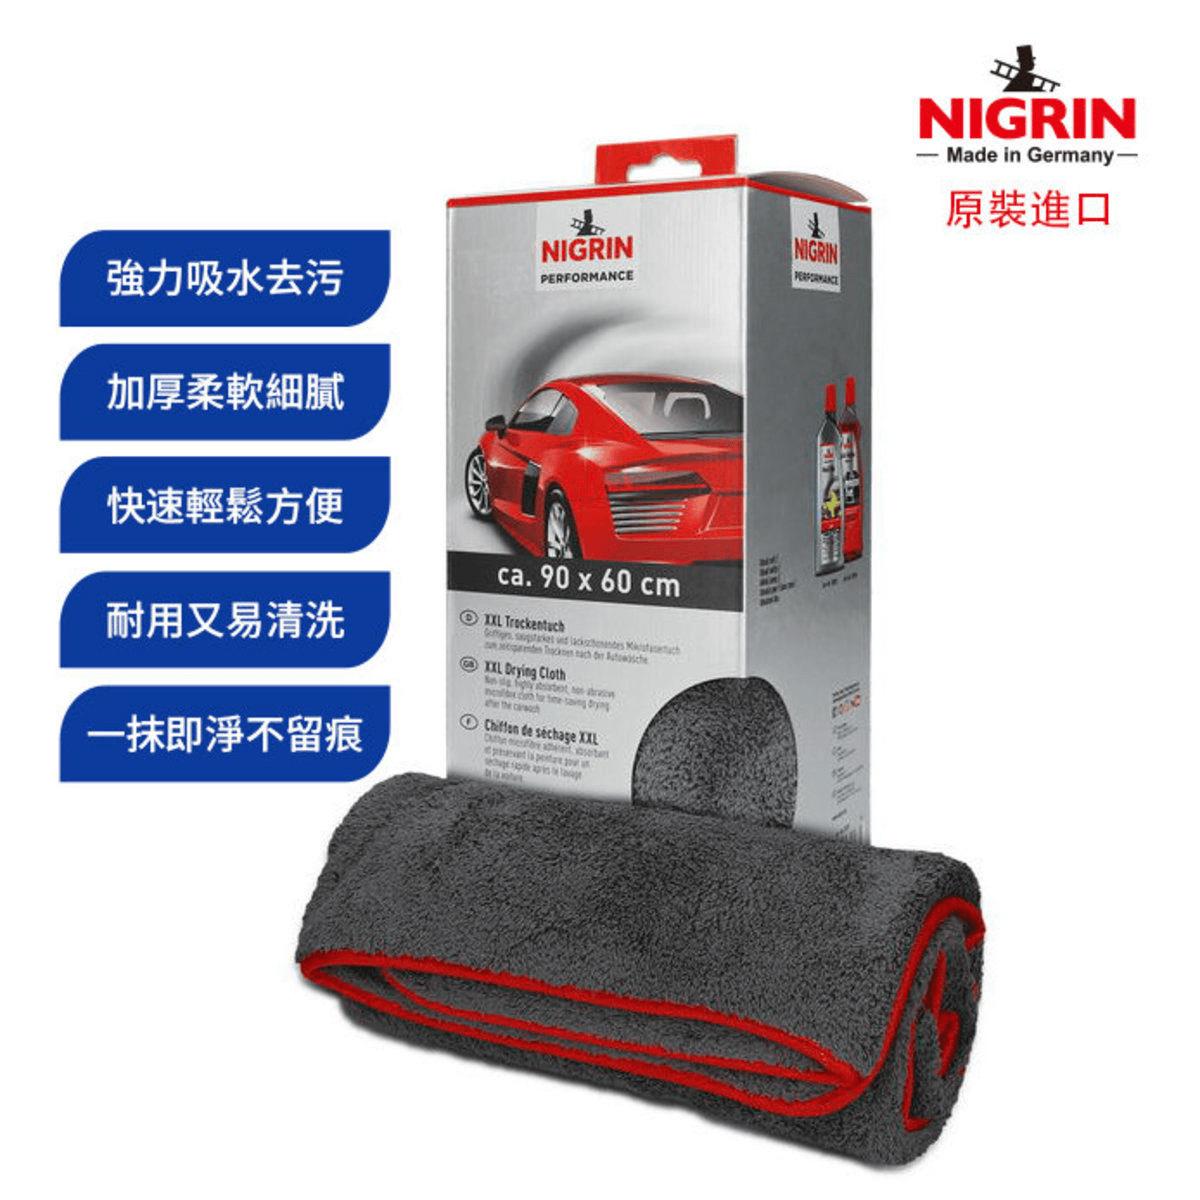 NIGRIN - 德國麗潔靈 2合1手指型洗車手套